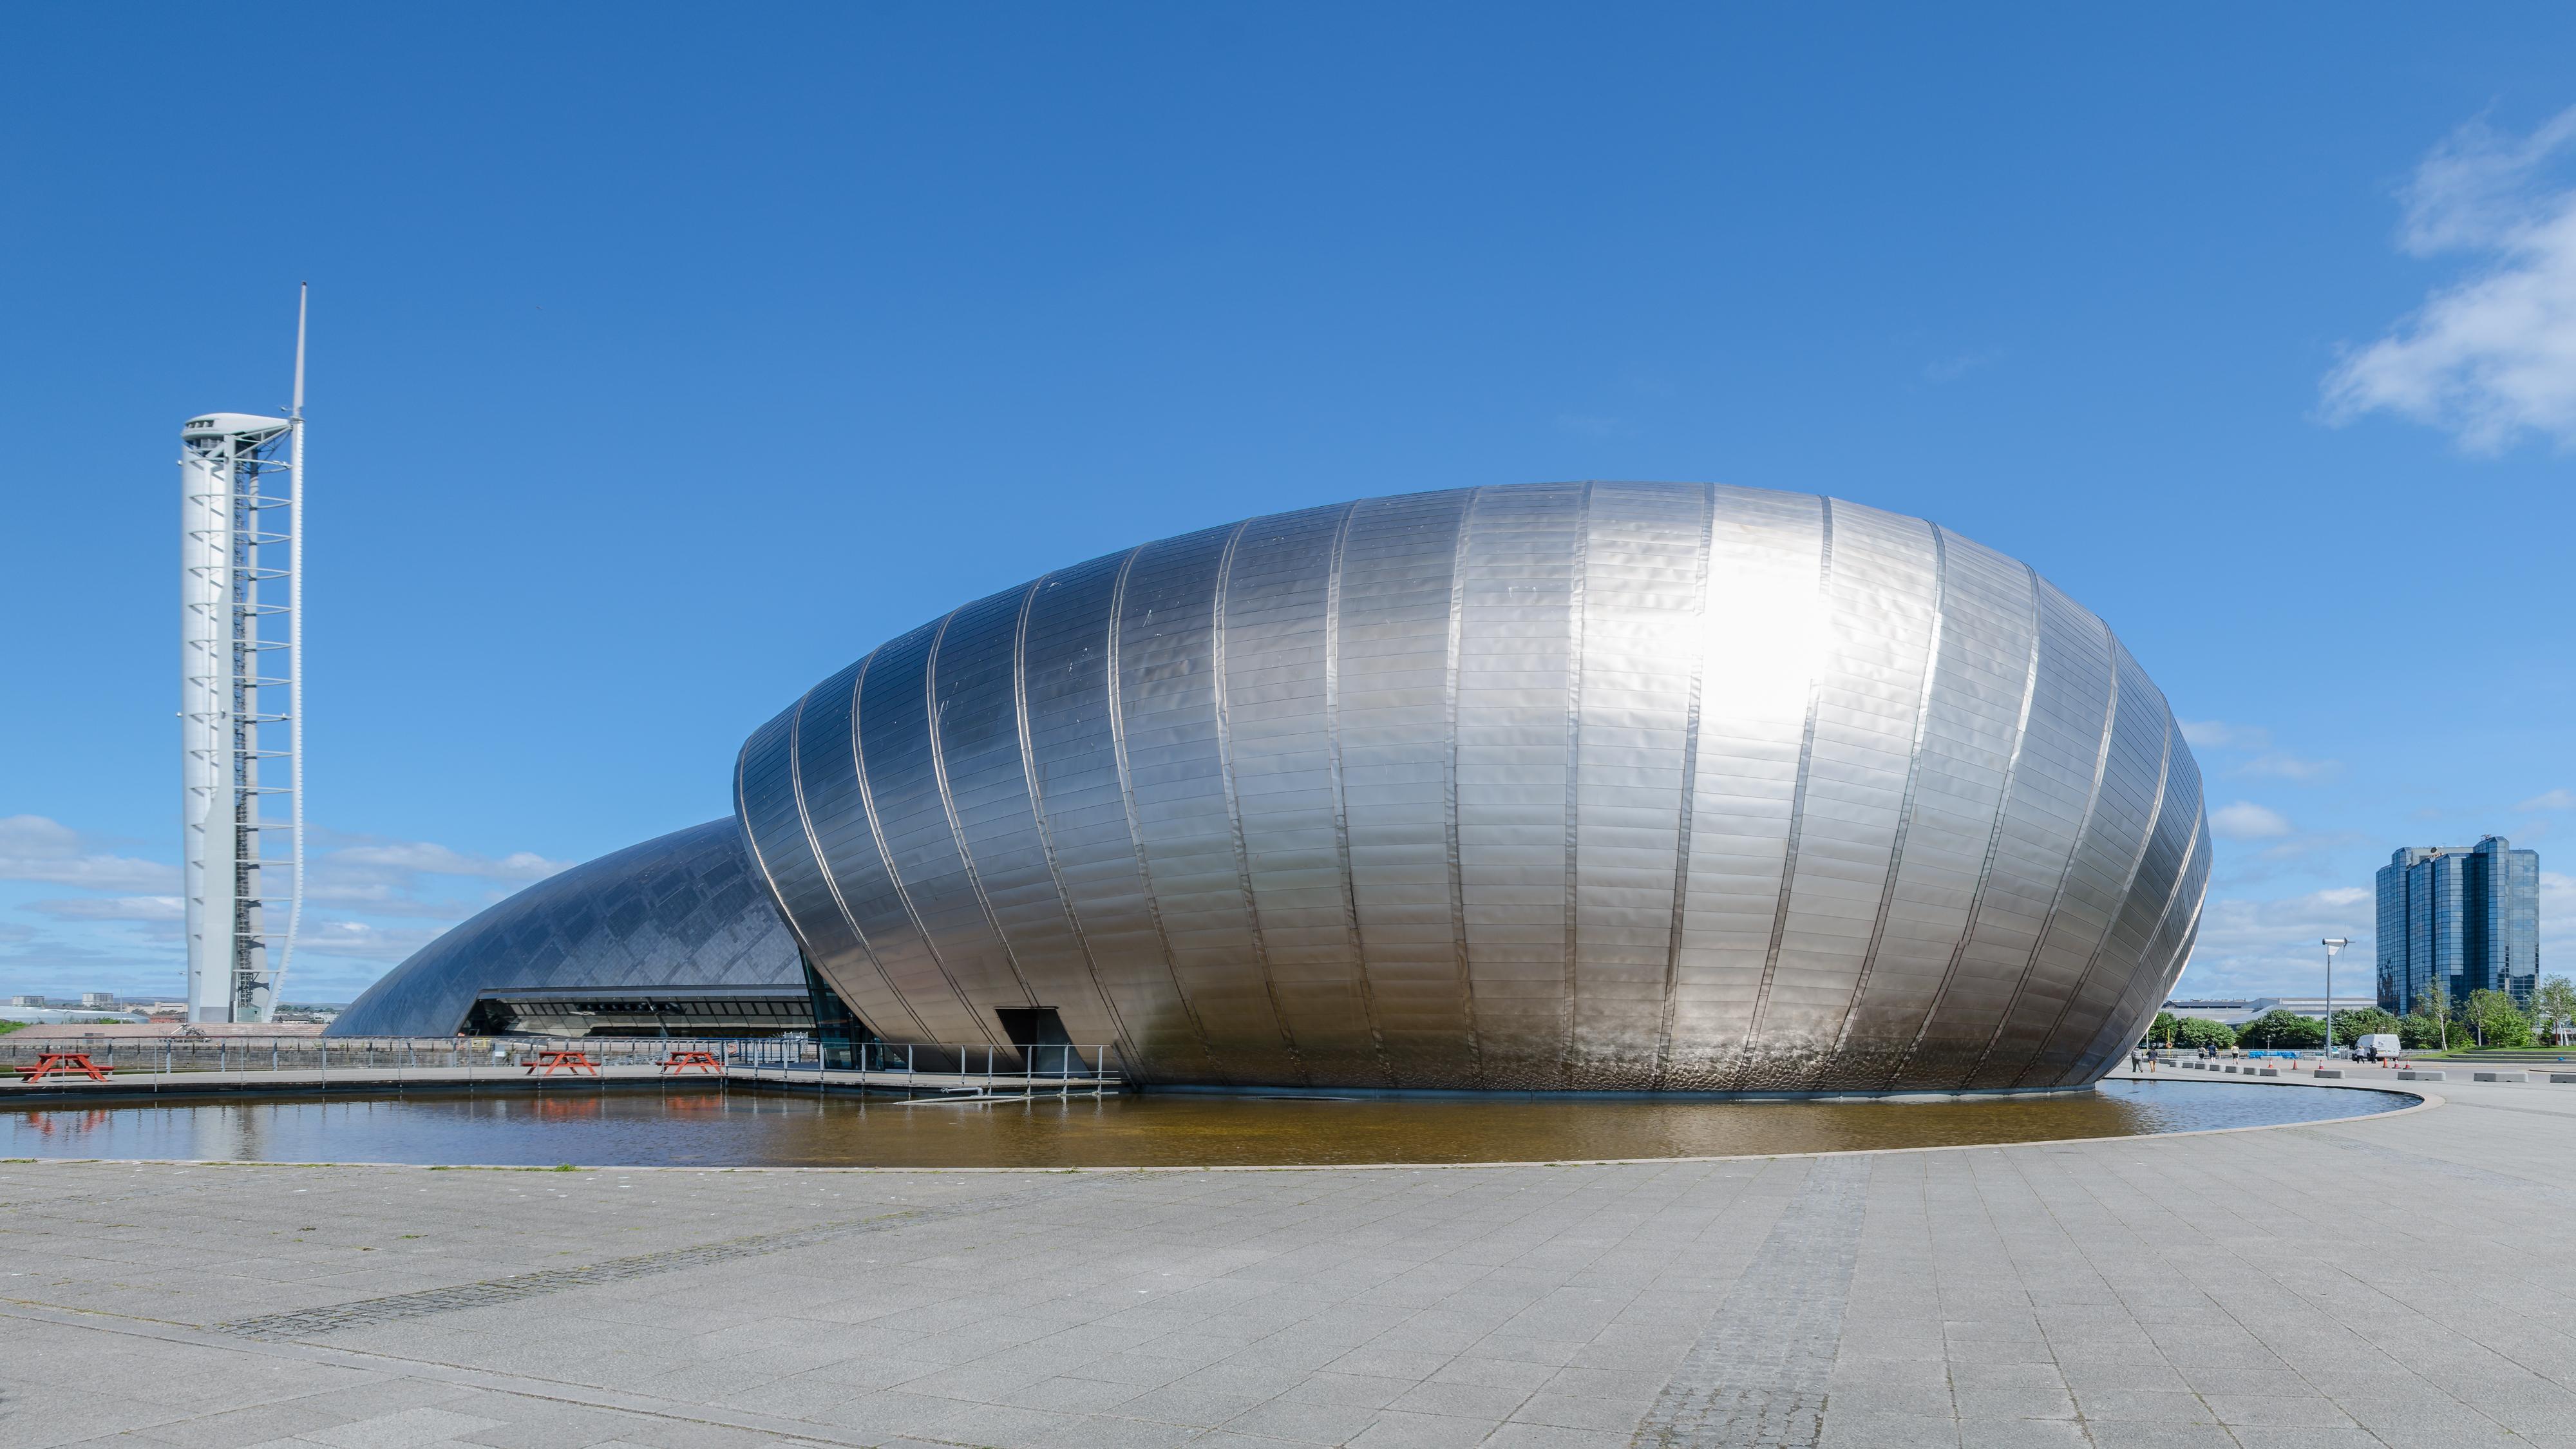 Bezienswaardigheden Schotland Top 10 - Nr 6 Glasgow Science Centre and Tower.jpg